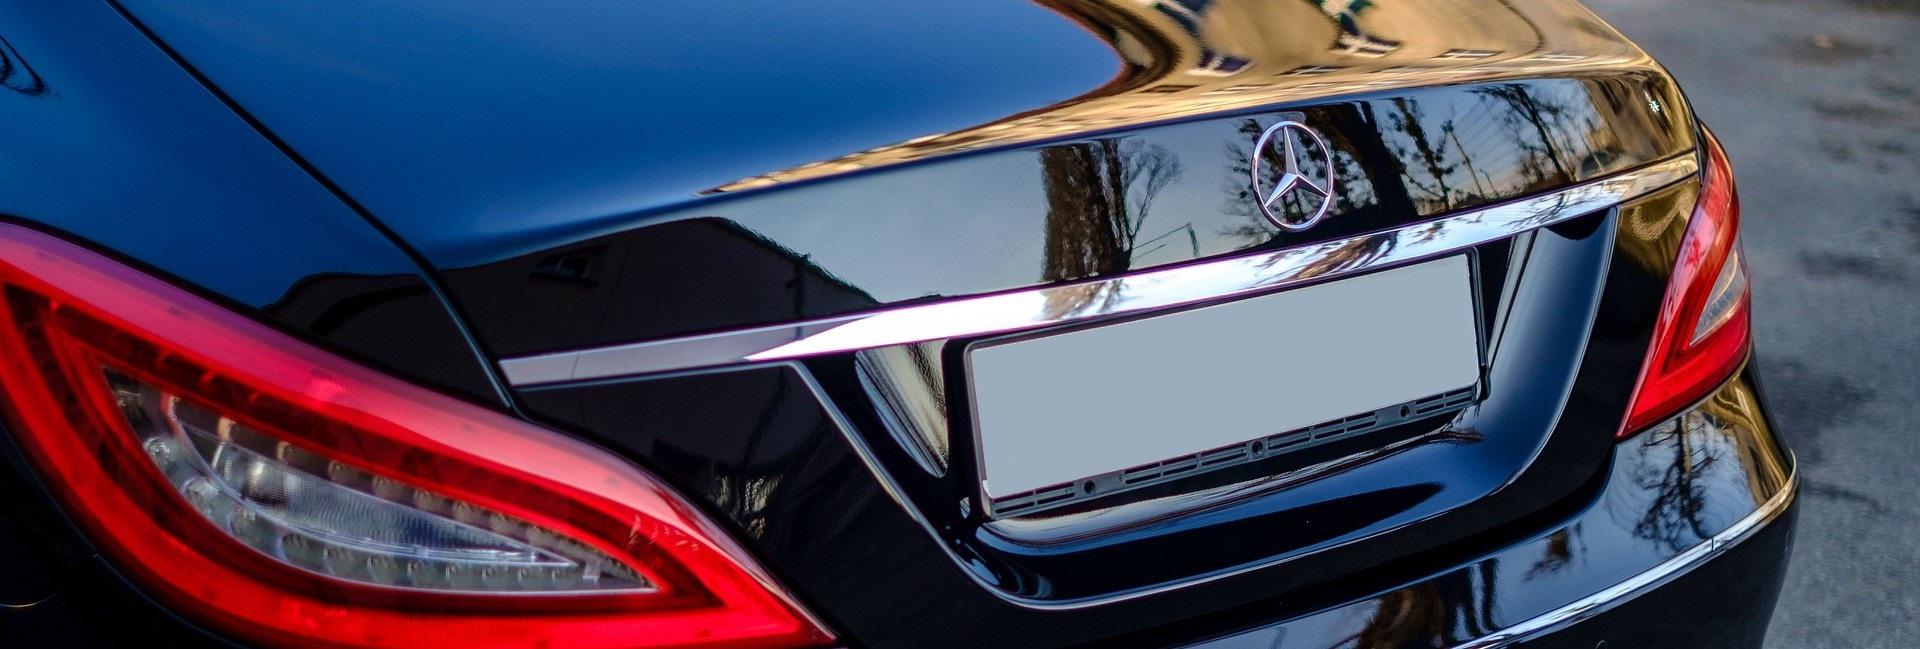 Mercedes in Los Altos, California | Breast Cancer Car Donations